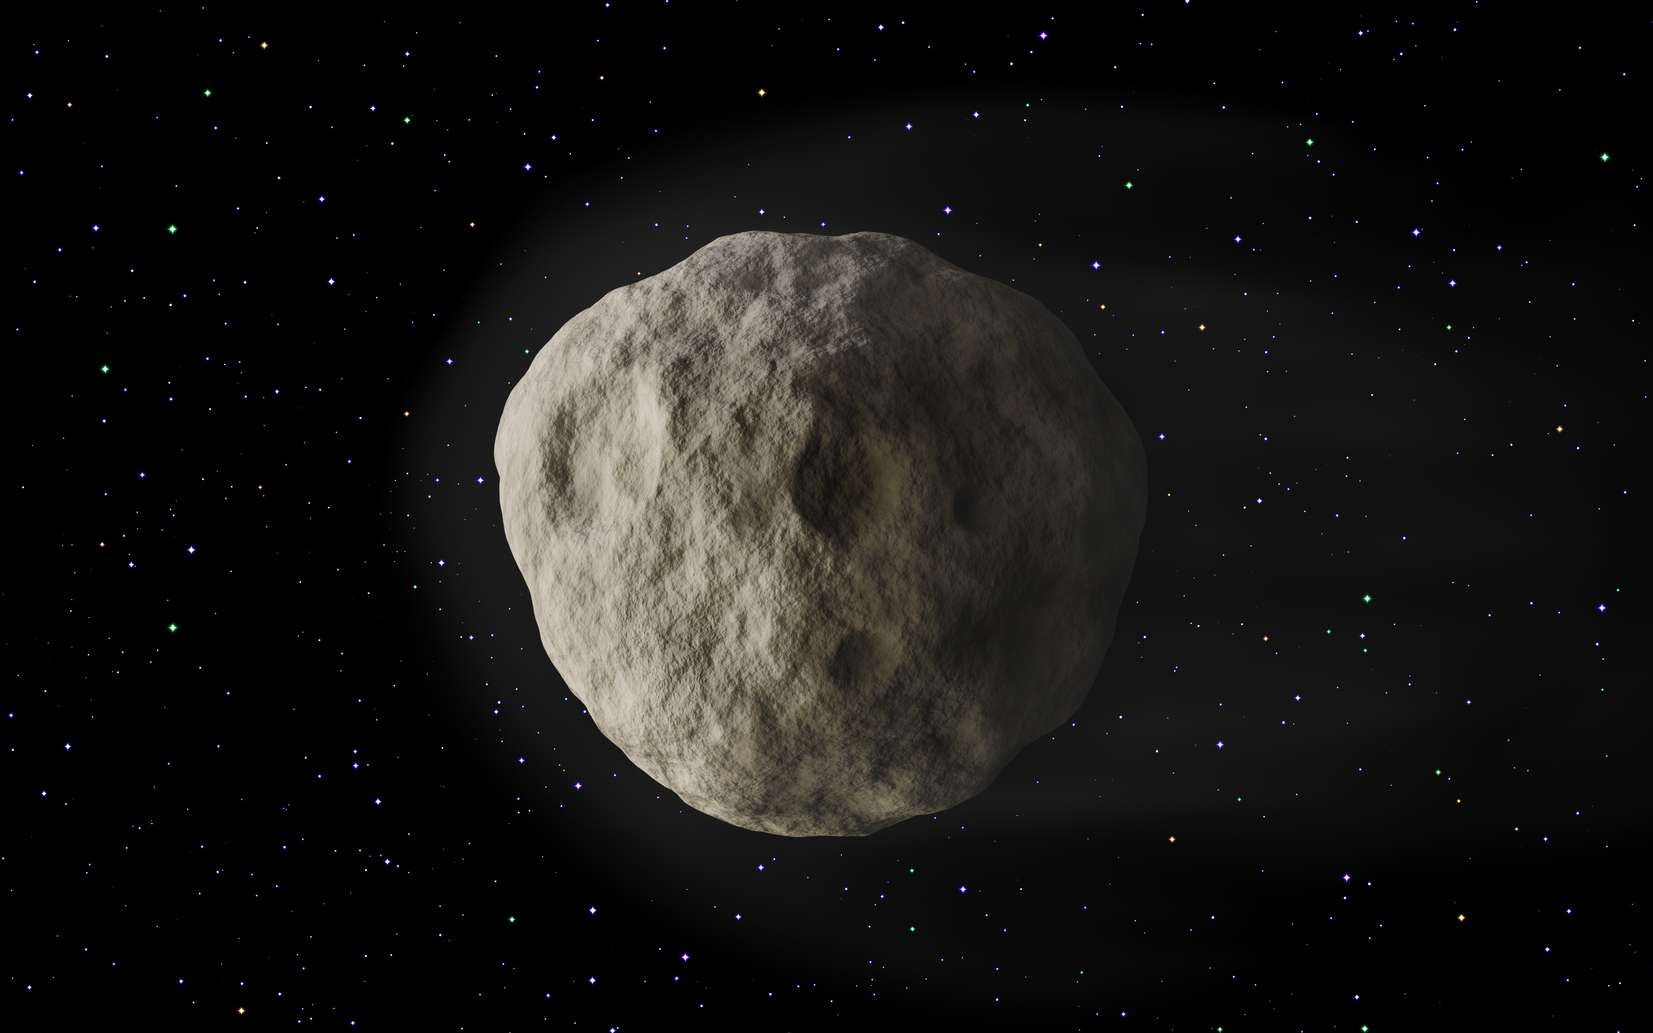 Illustration d'un astéroïde sphérique. © lumedix, fotolia